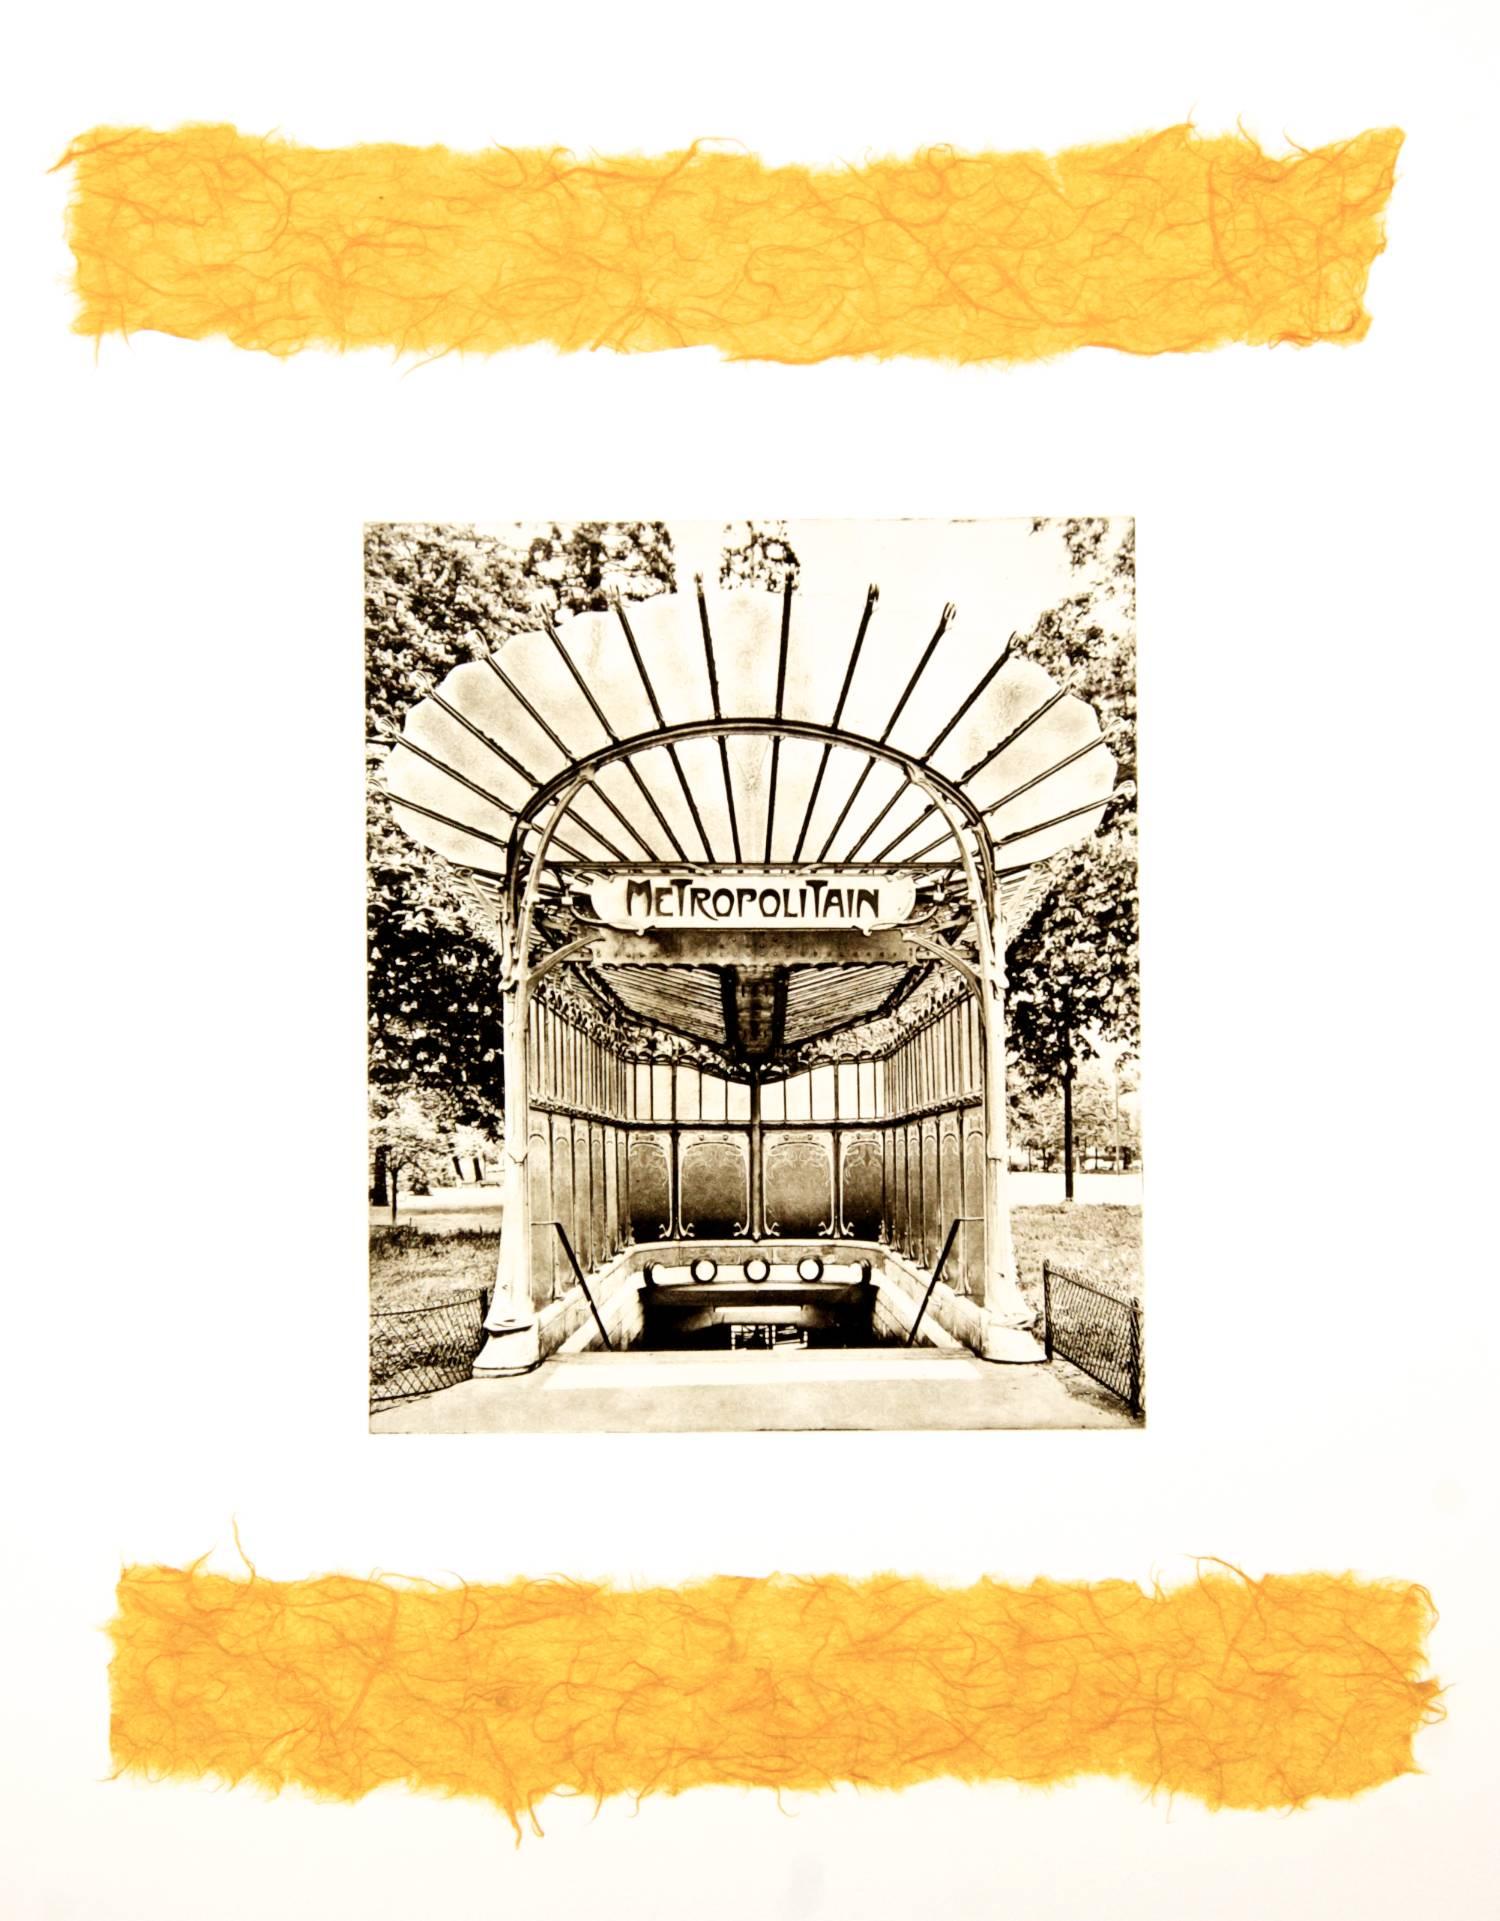 Metropolitain chine-collé (mango)